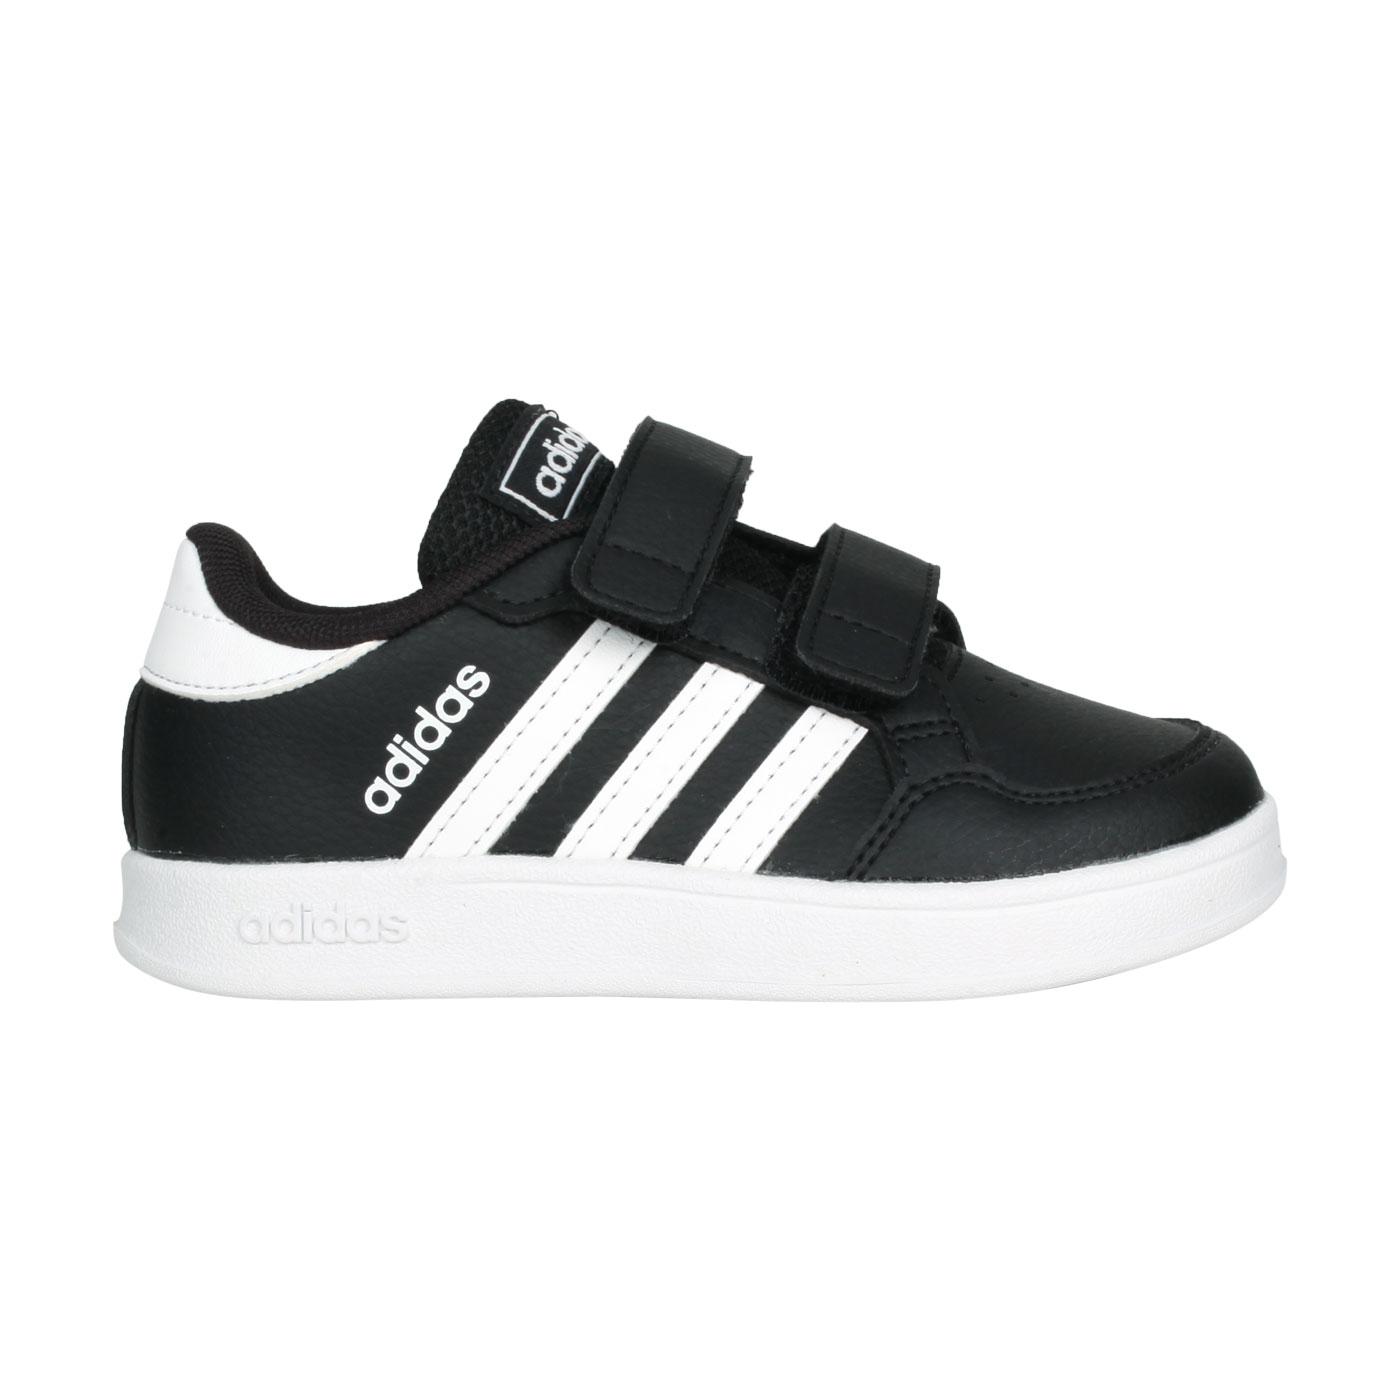 ADIDAS 小童運動鞋  @BREAKNET I@FZ0091 - 黑白